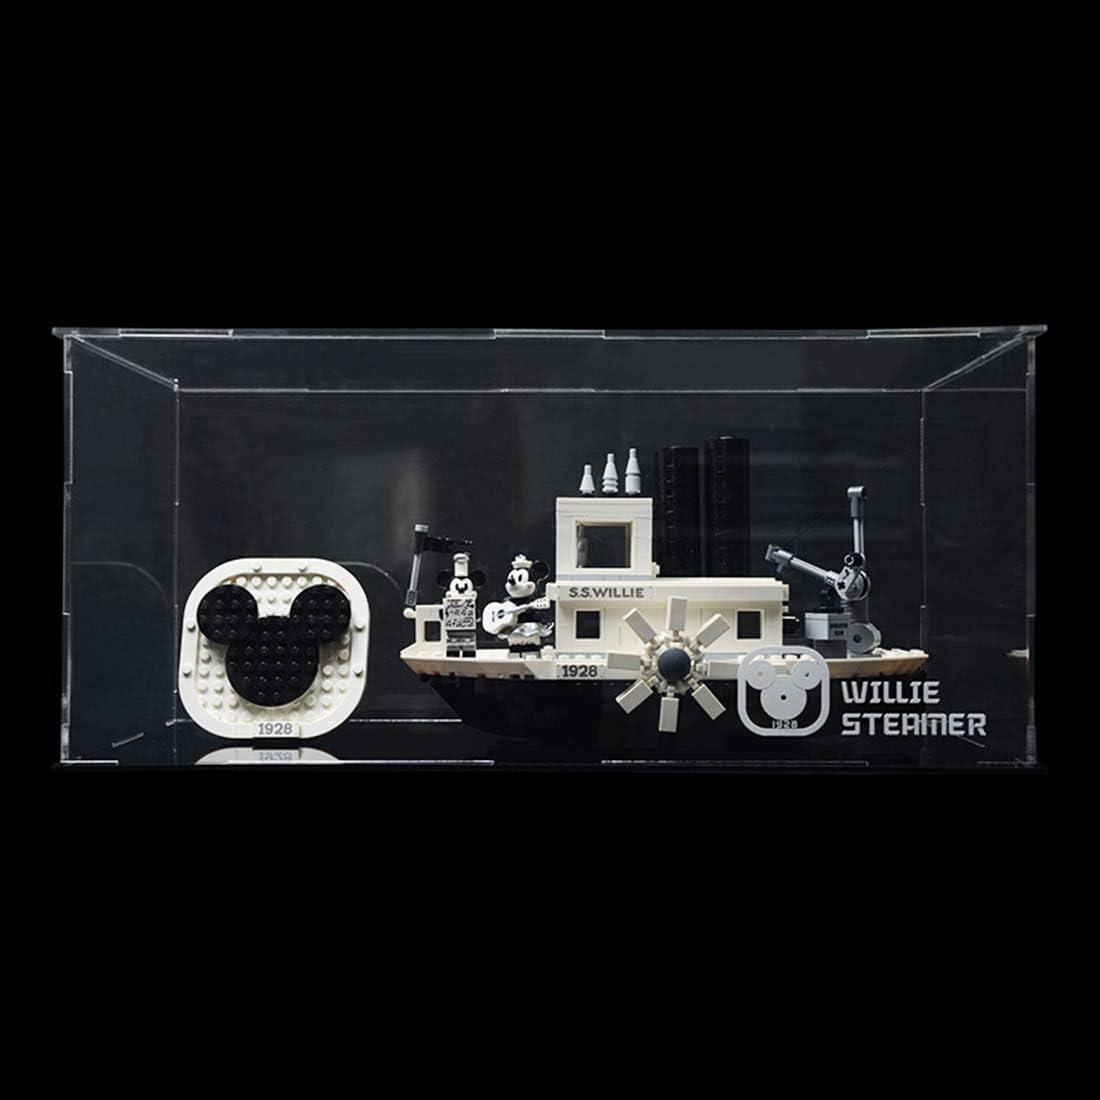 Schaukasten Acryl Vitrine Display Case f/ür Lego Disney Mickey Willie Steamship 21317 Ohne Modell DXX Acryl Schaukasten Vitrine